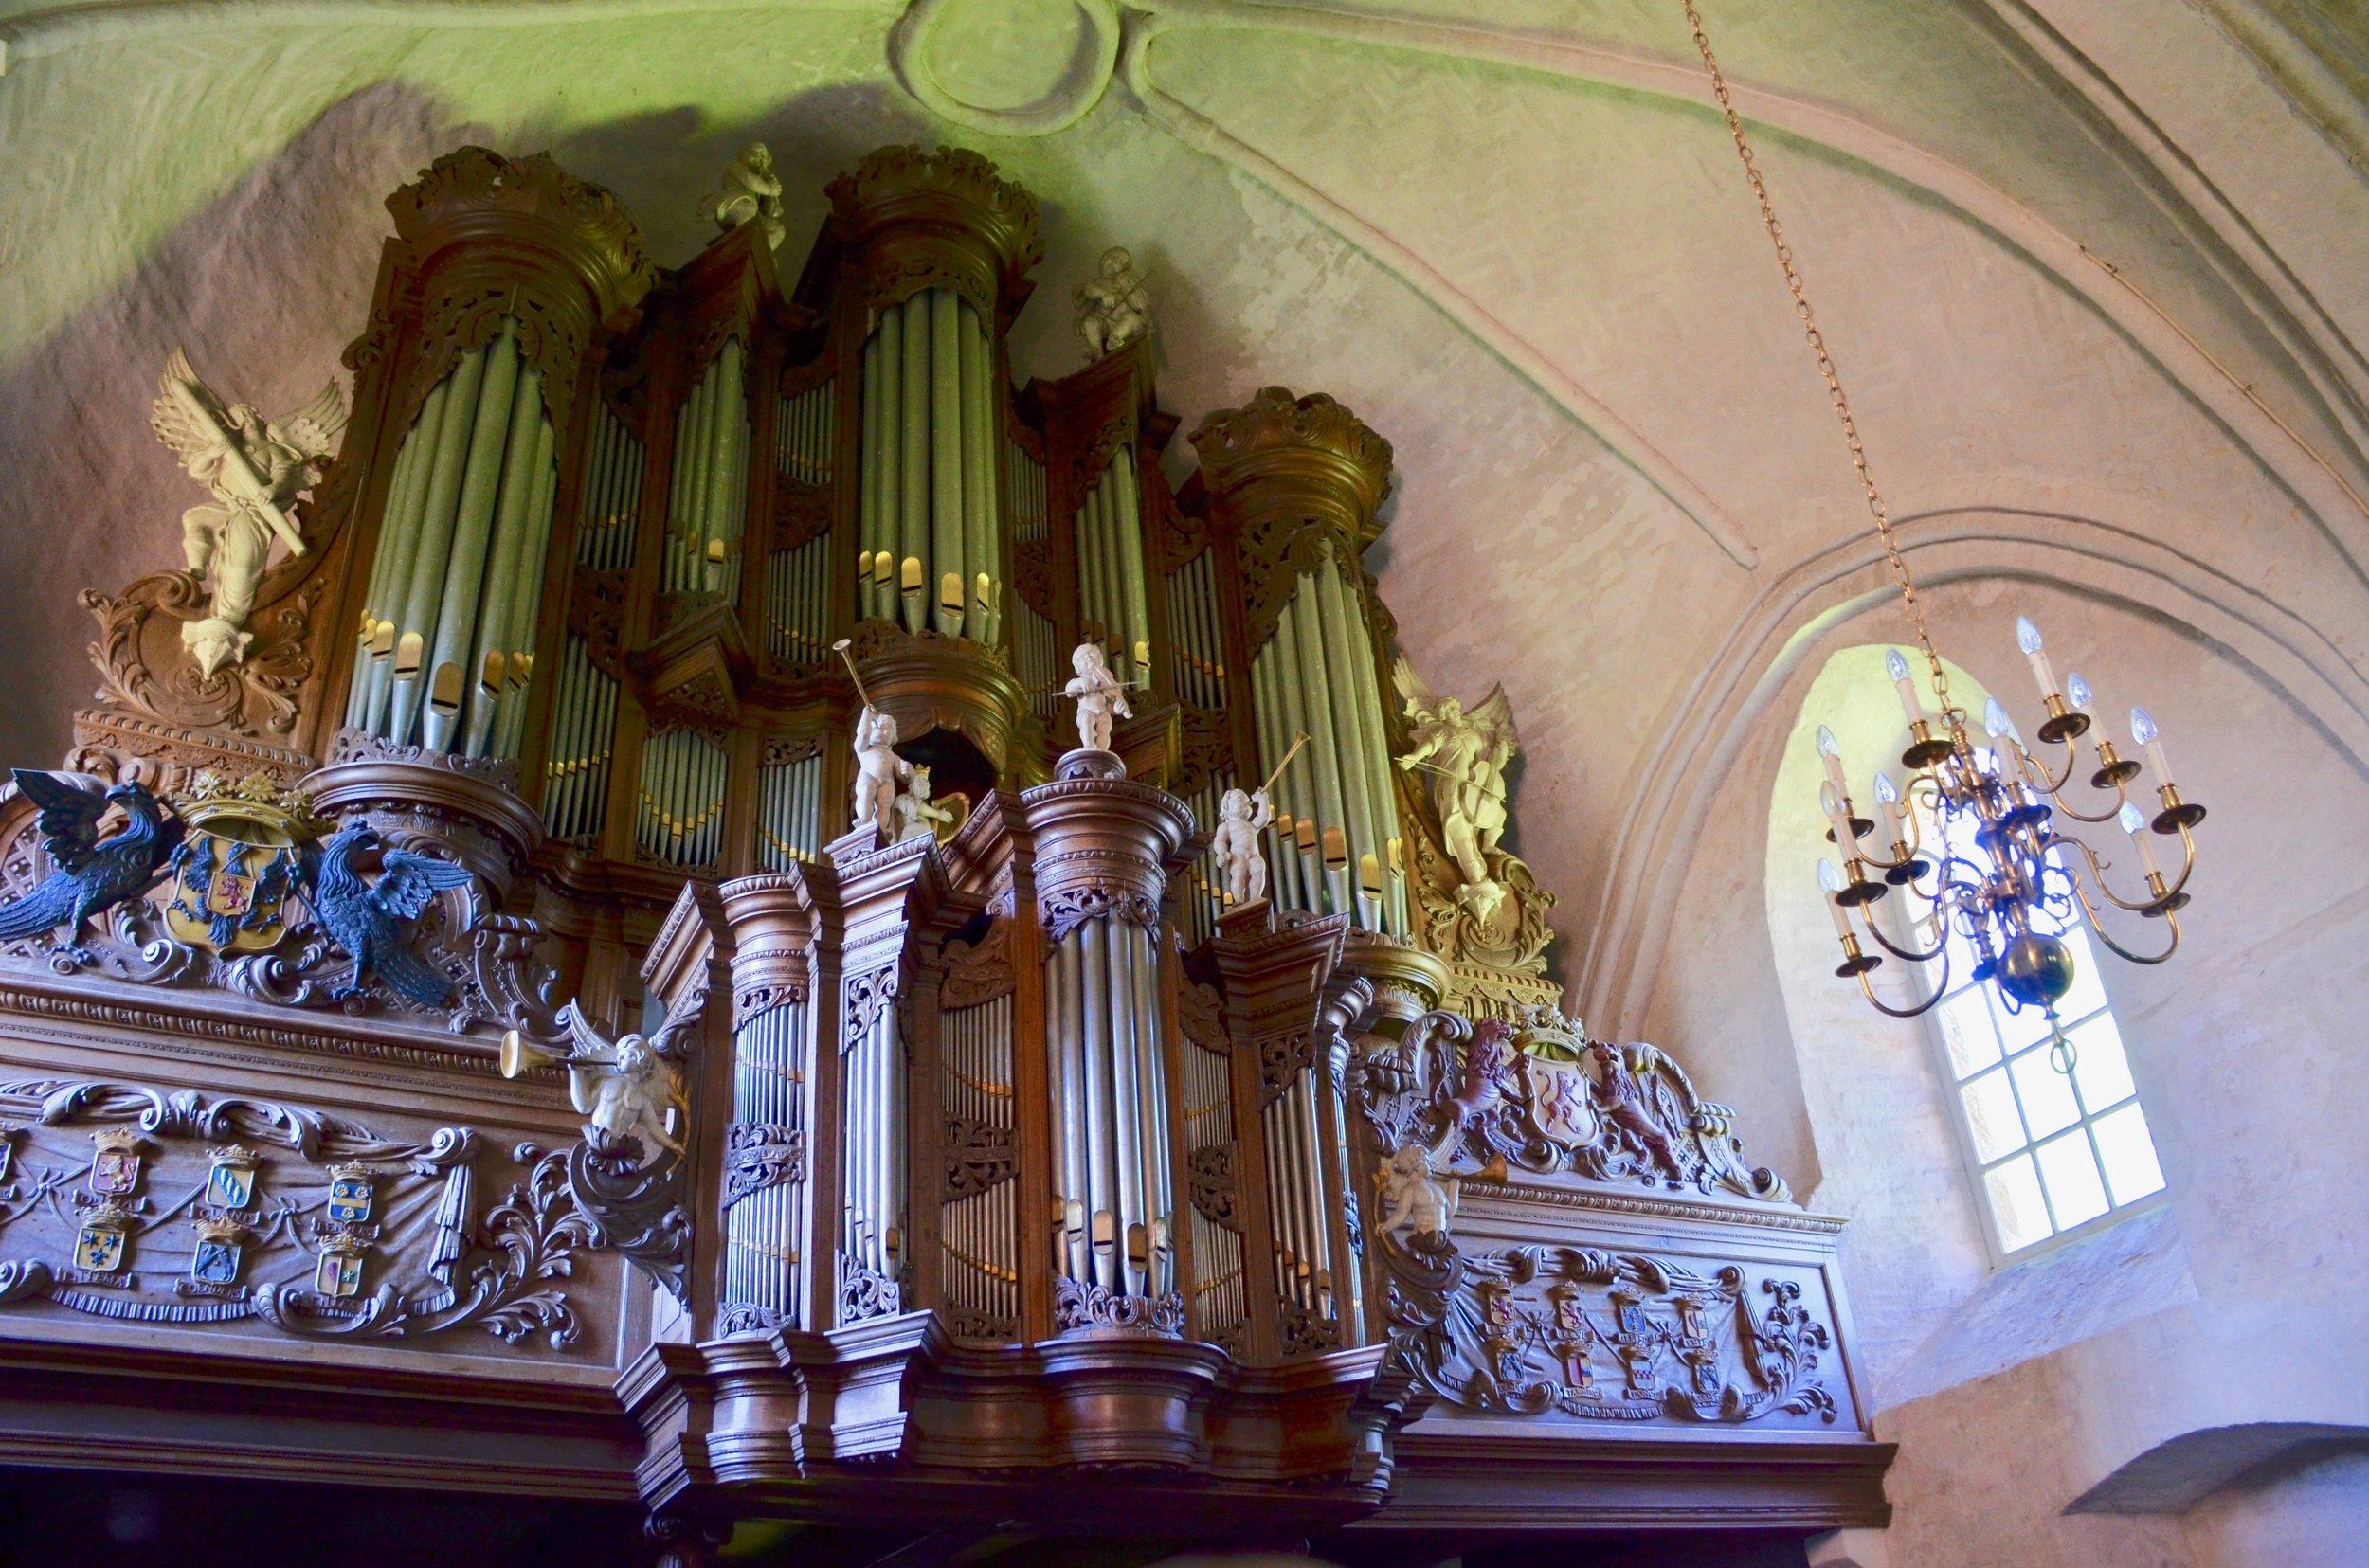 The 1733 Hinsz Organ, Leens, Holland.